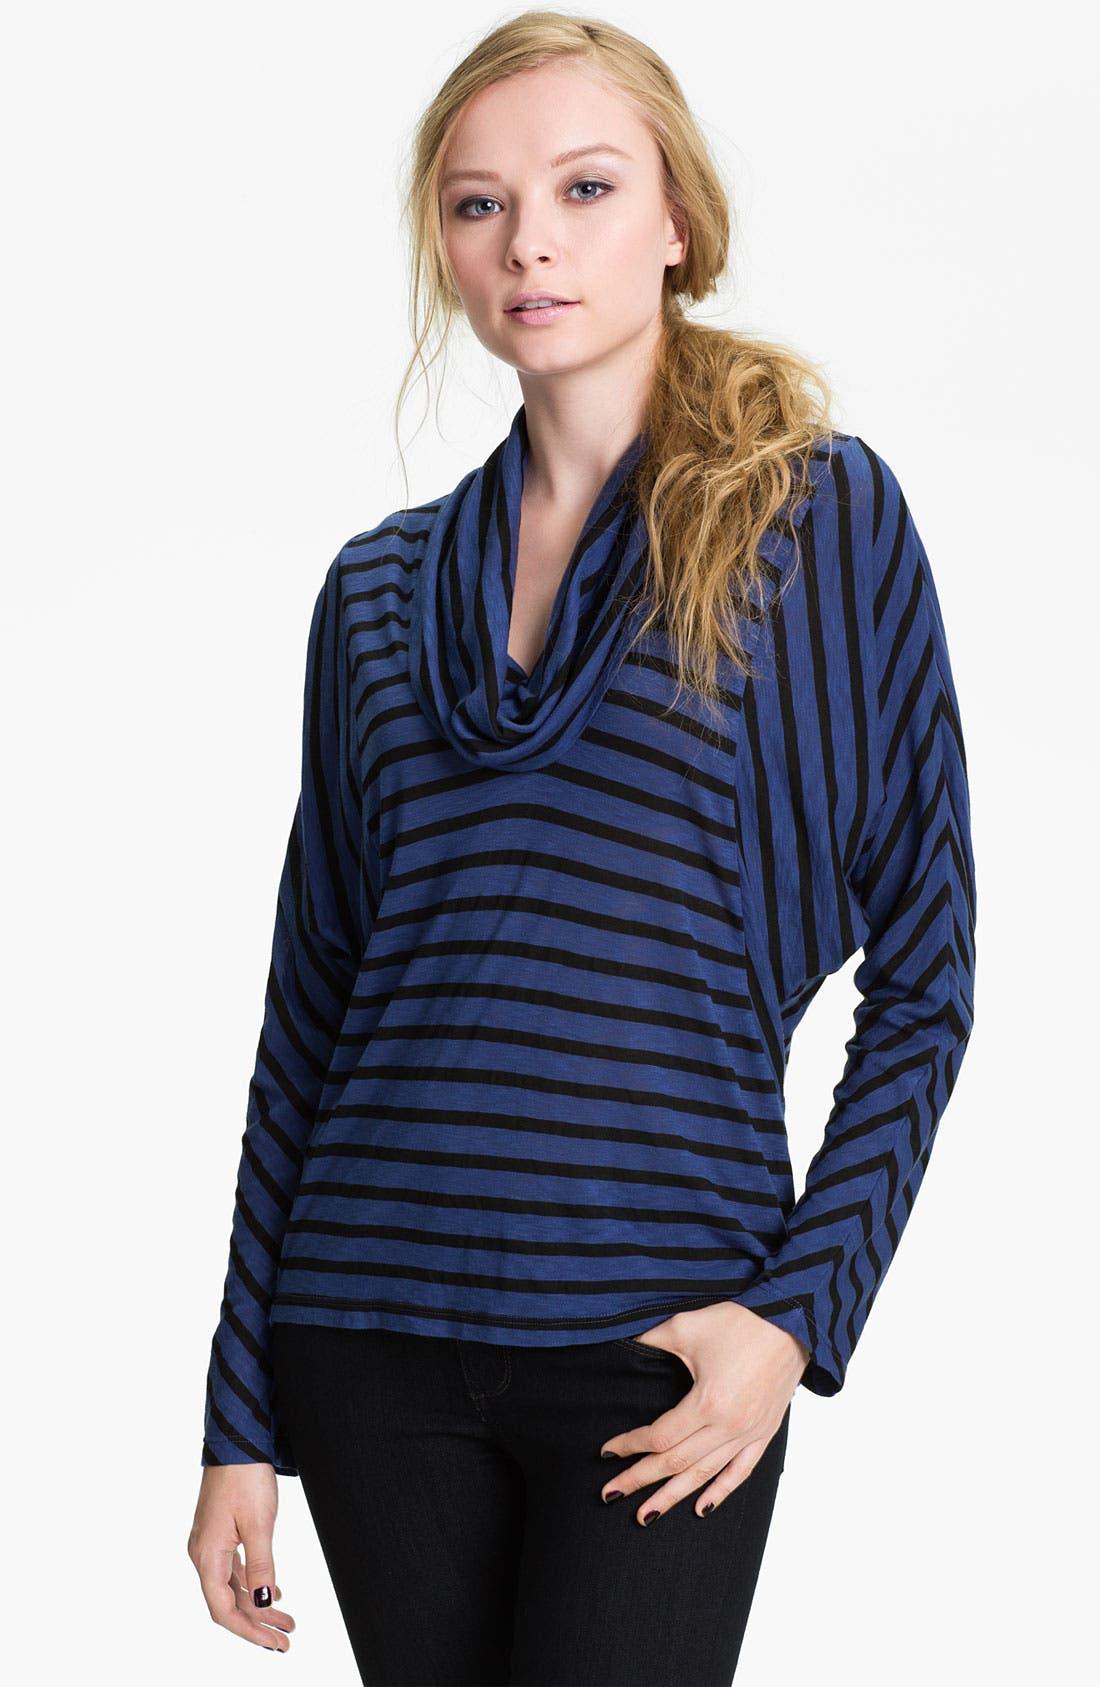 Main Image - Splendid 'Venice' Stripe Cowl Neck Top